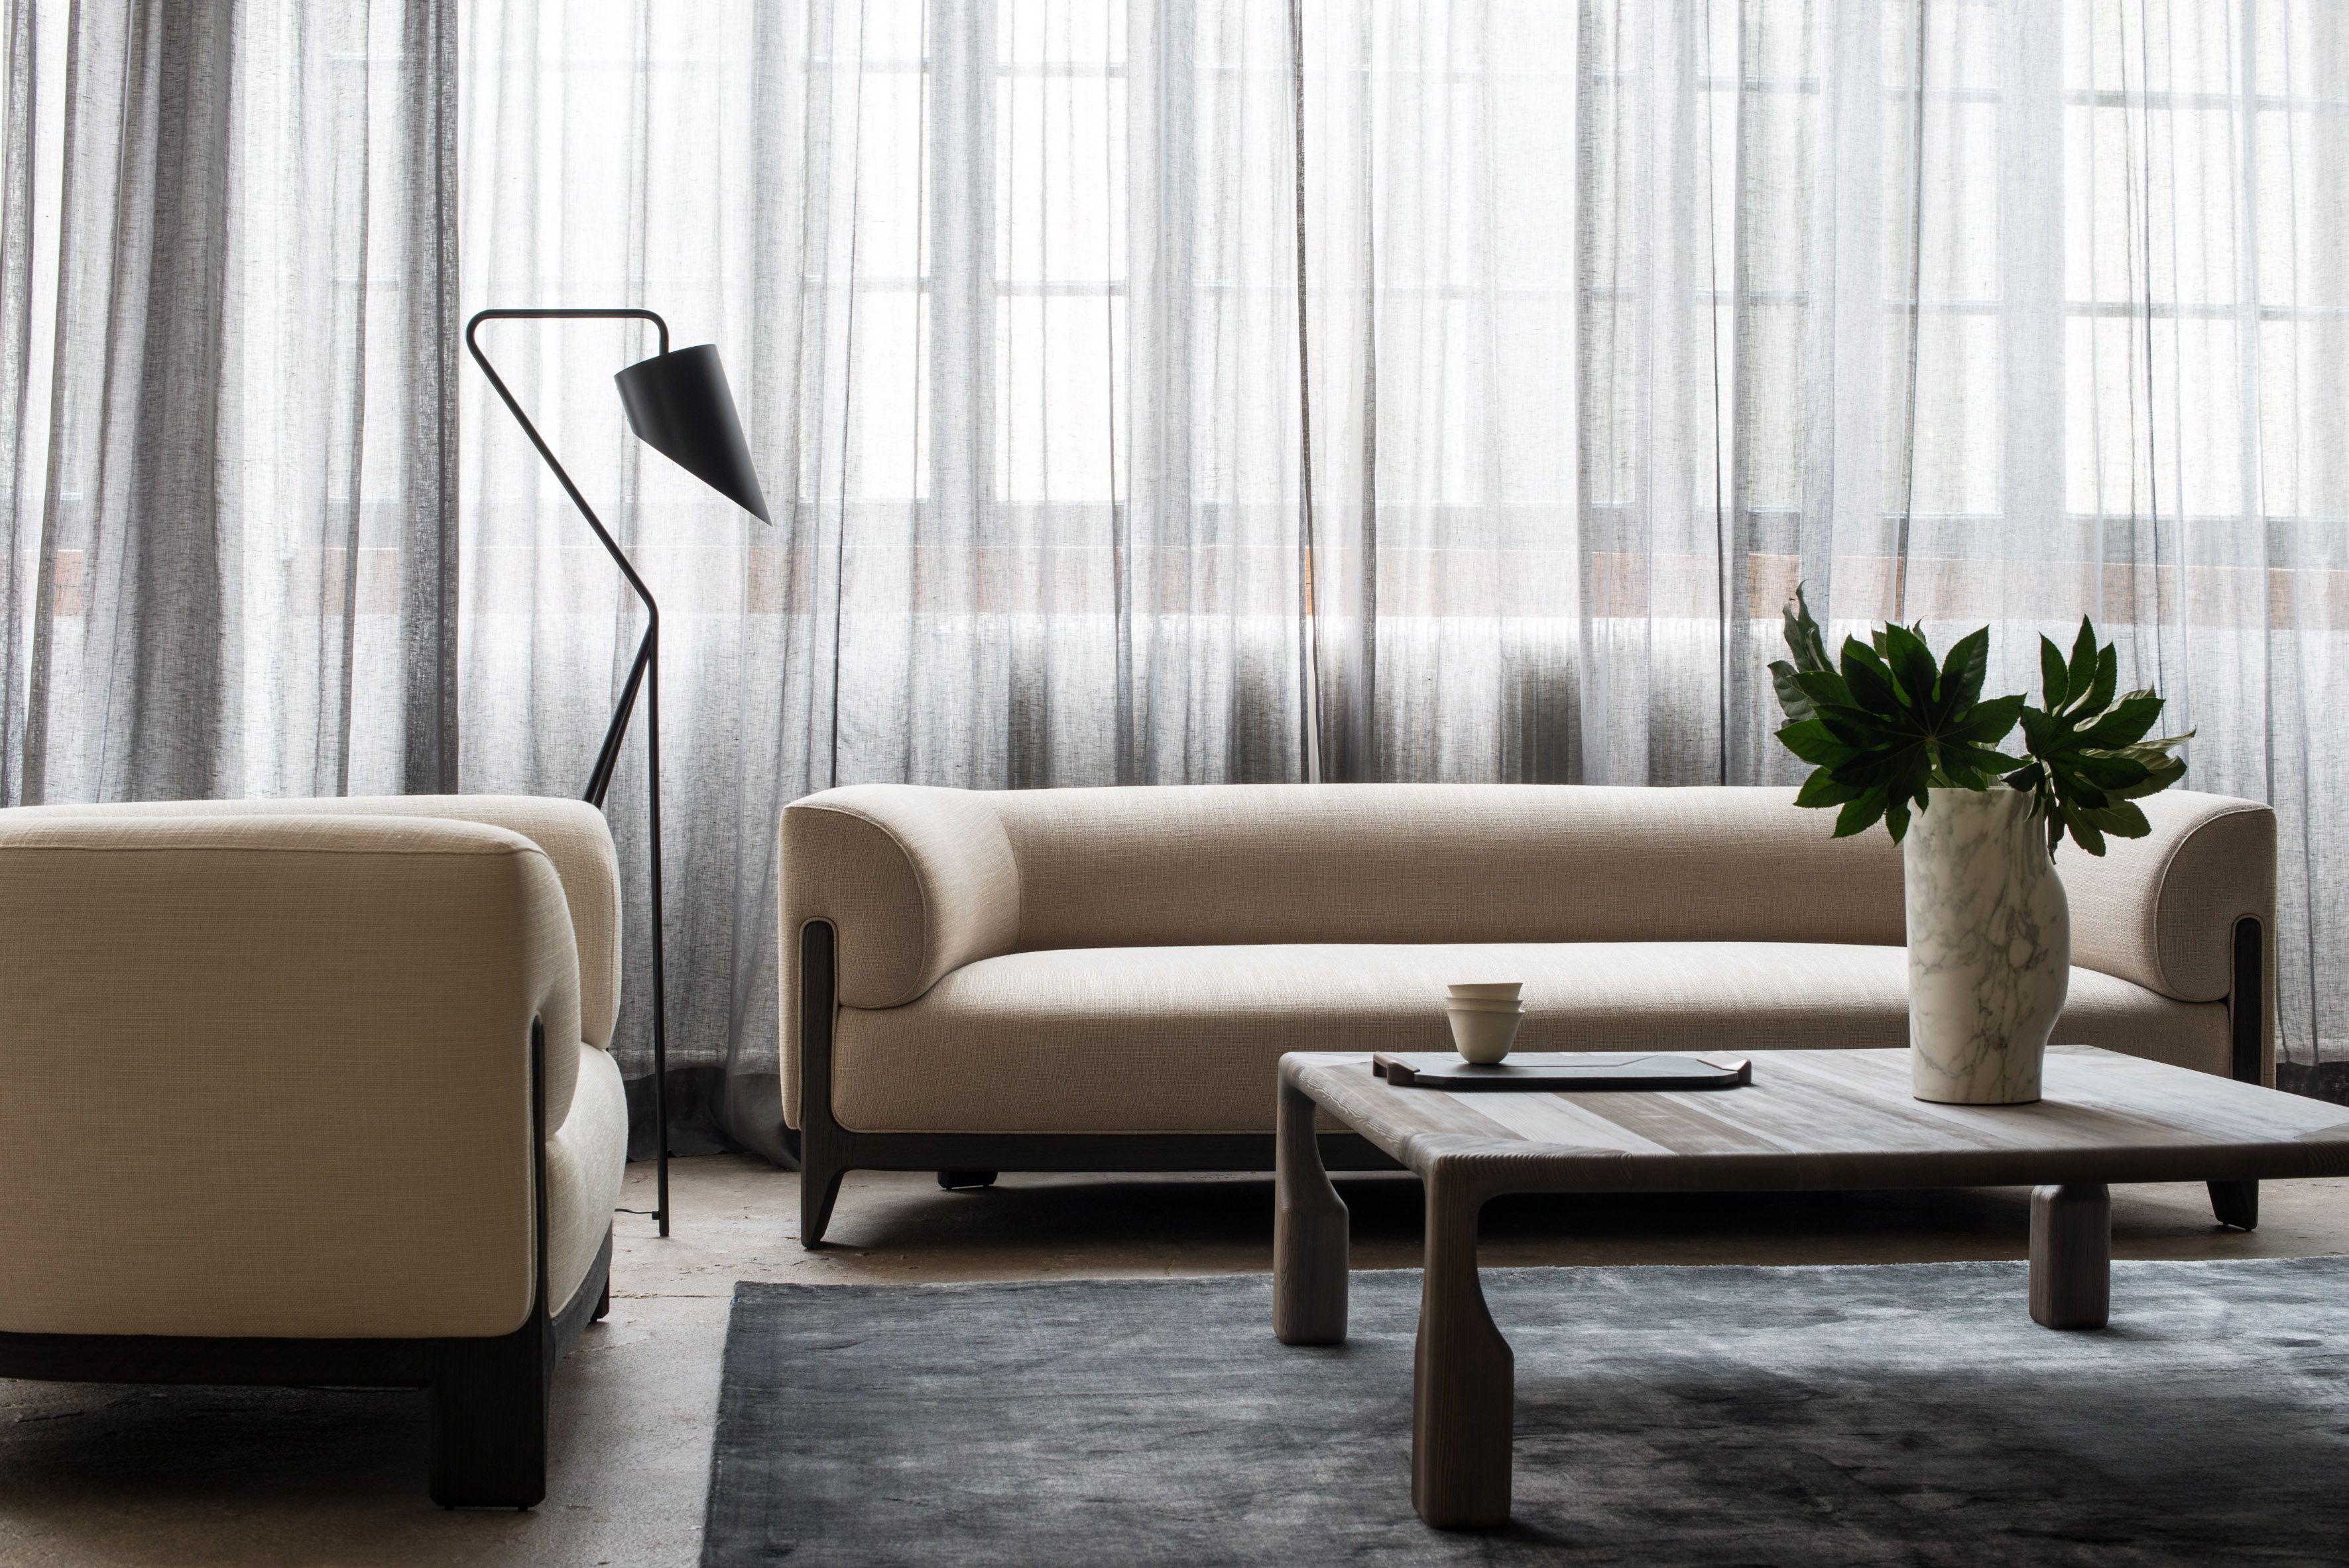 settee furniture designs. BOB - Sofa And Armchair Christophe Delcourt Settee Furniture Designs